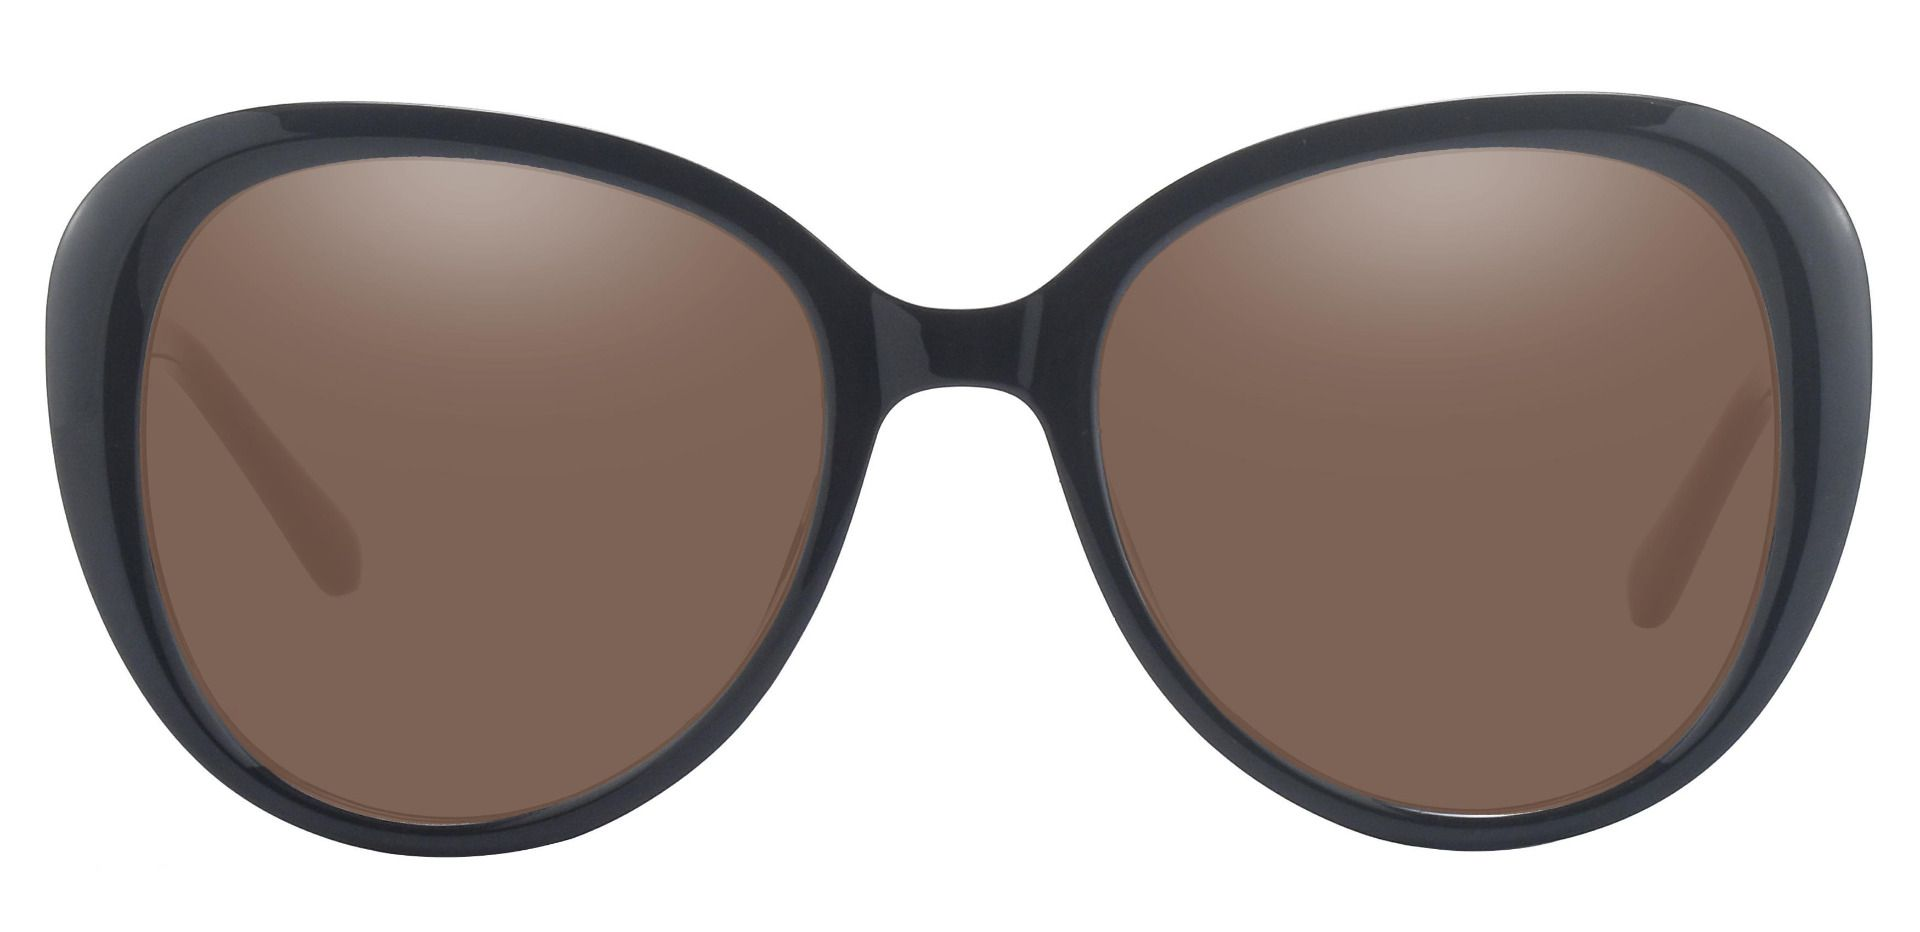 Sheridan Oval Prescription Sunglasses - Black Frame With Brown Lenses